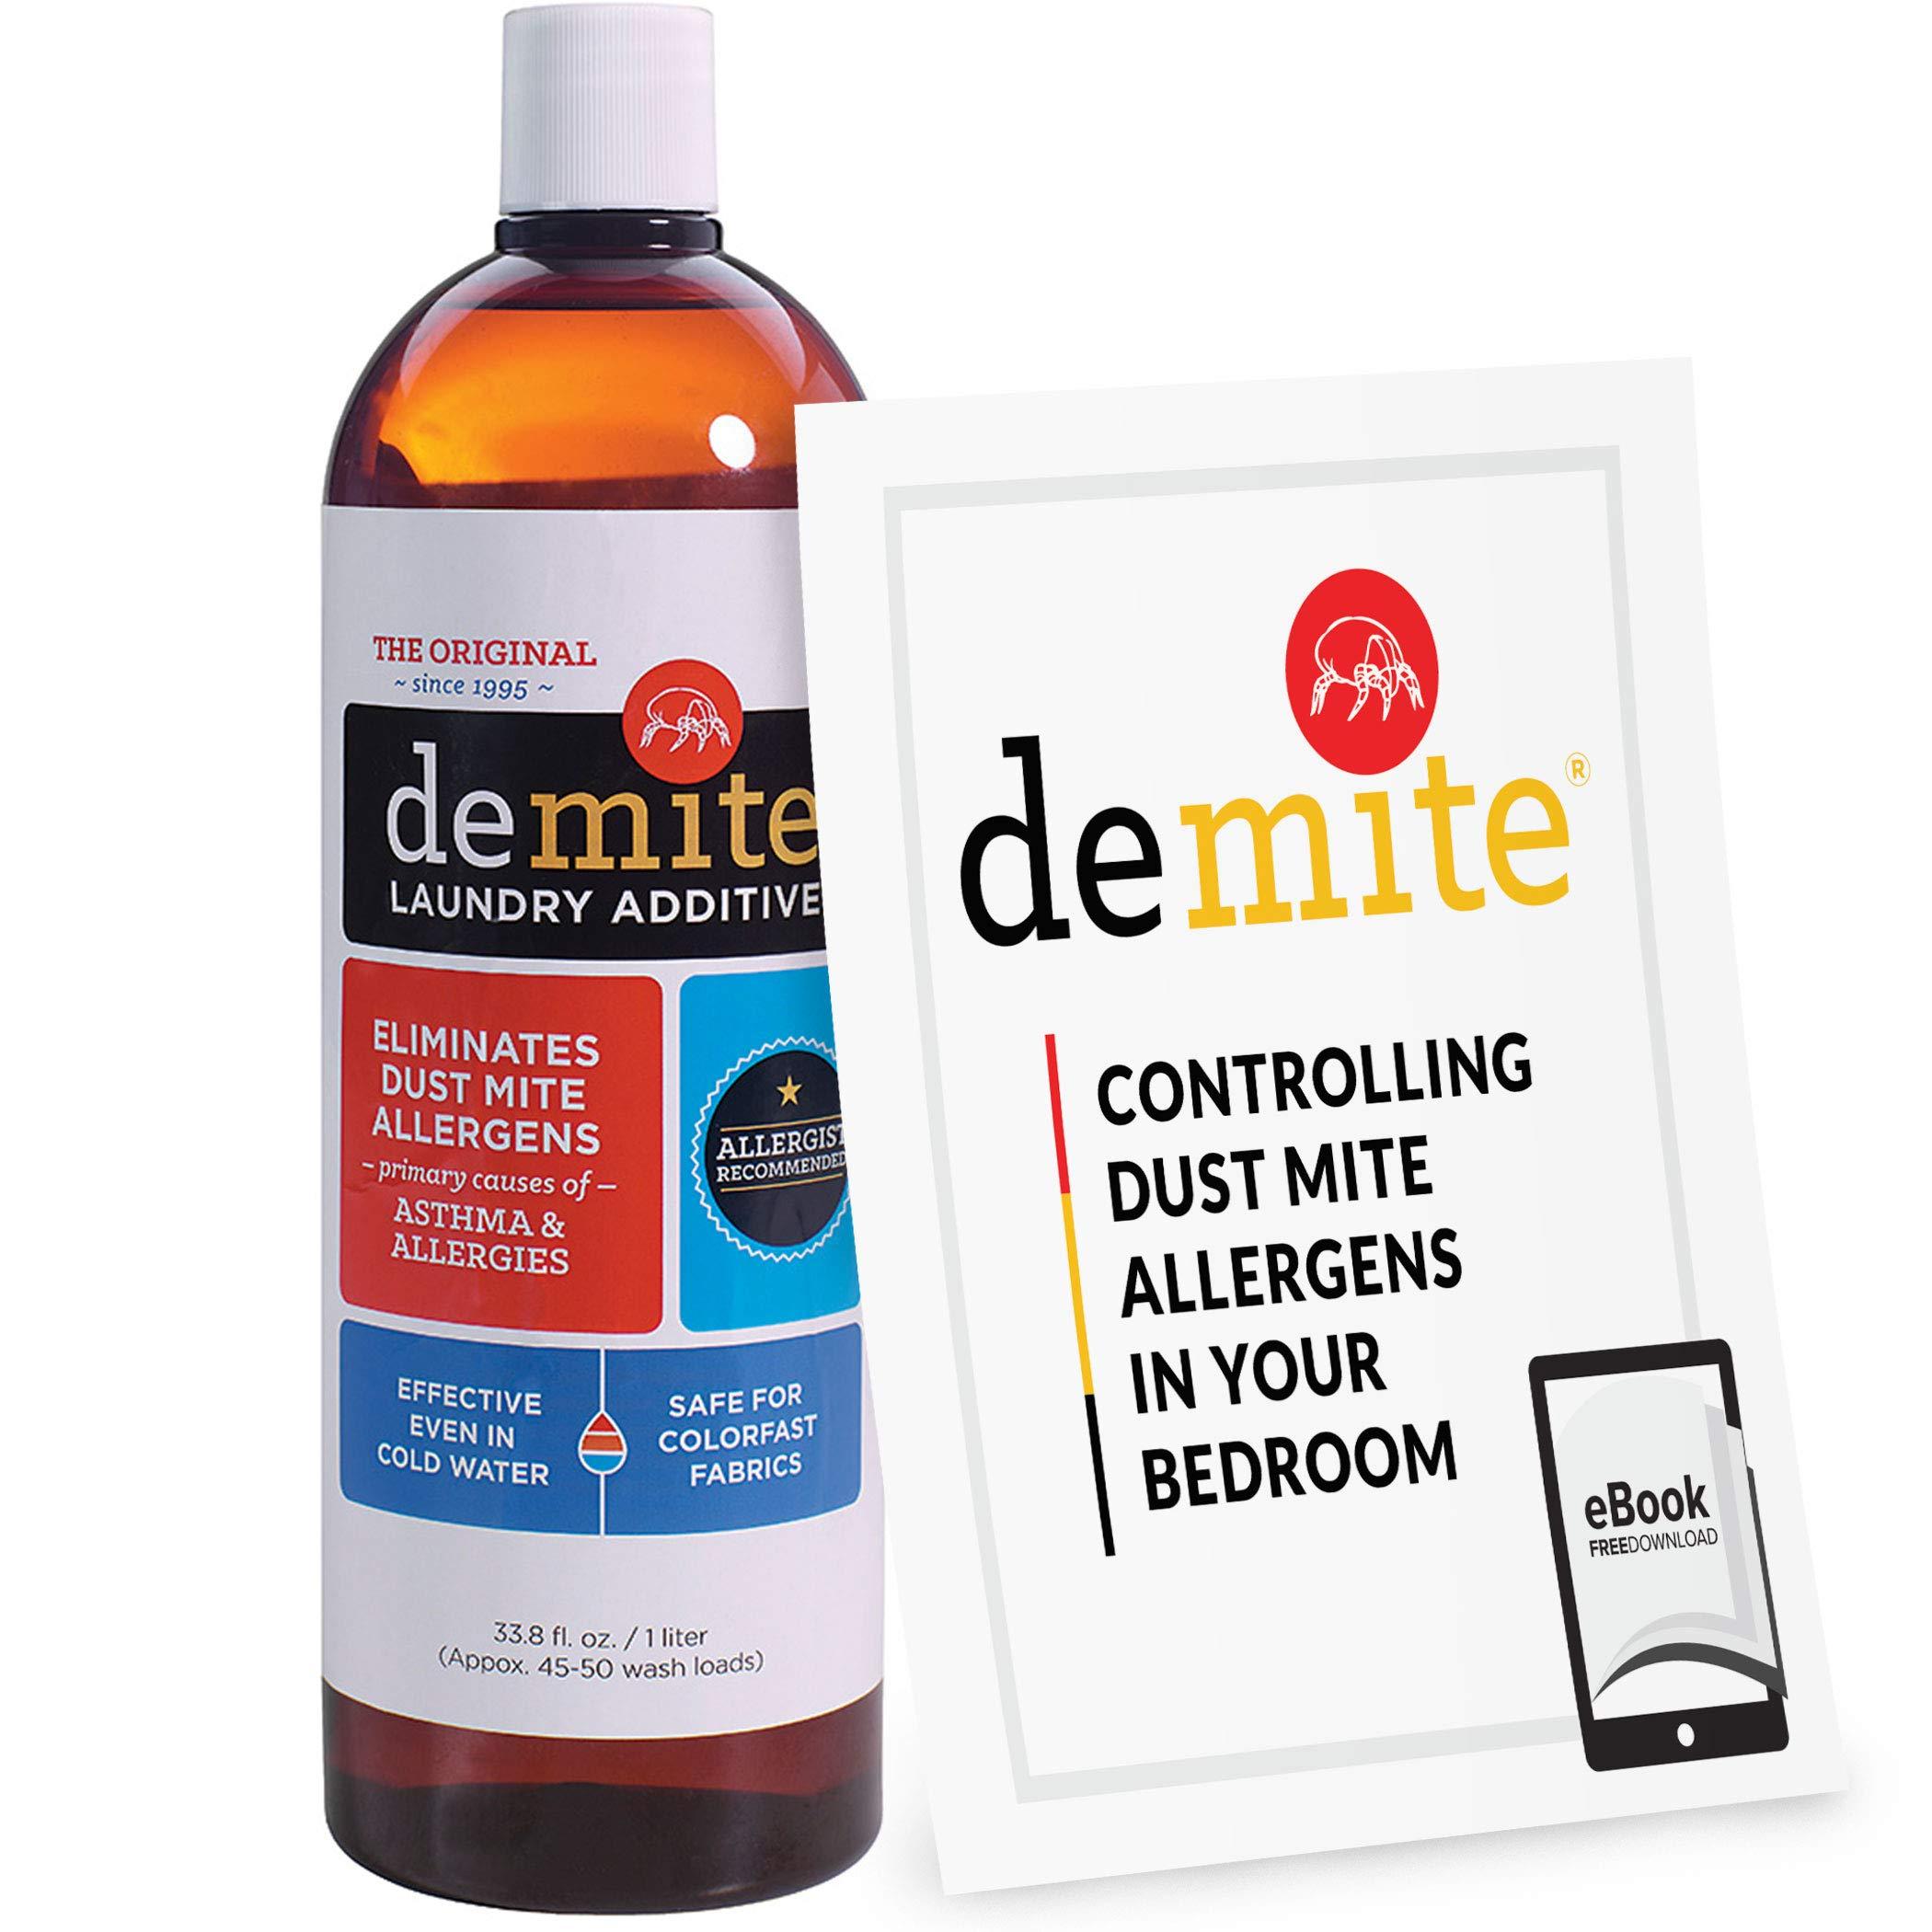 DeMite Laundry Additive (1 Liter) Allergen Eliminator with Bonus eBook - Expert Pro Tips to Eliminate Dust Mite Allergens by DeMite